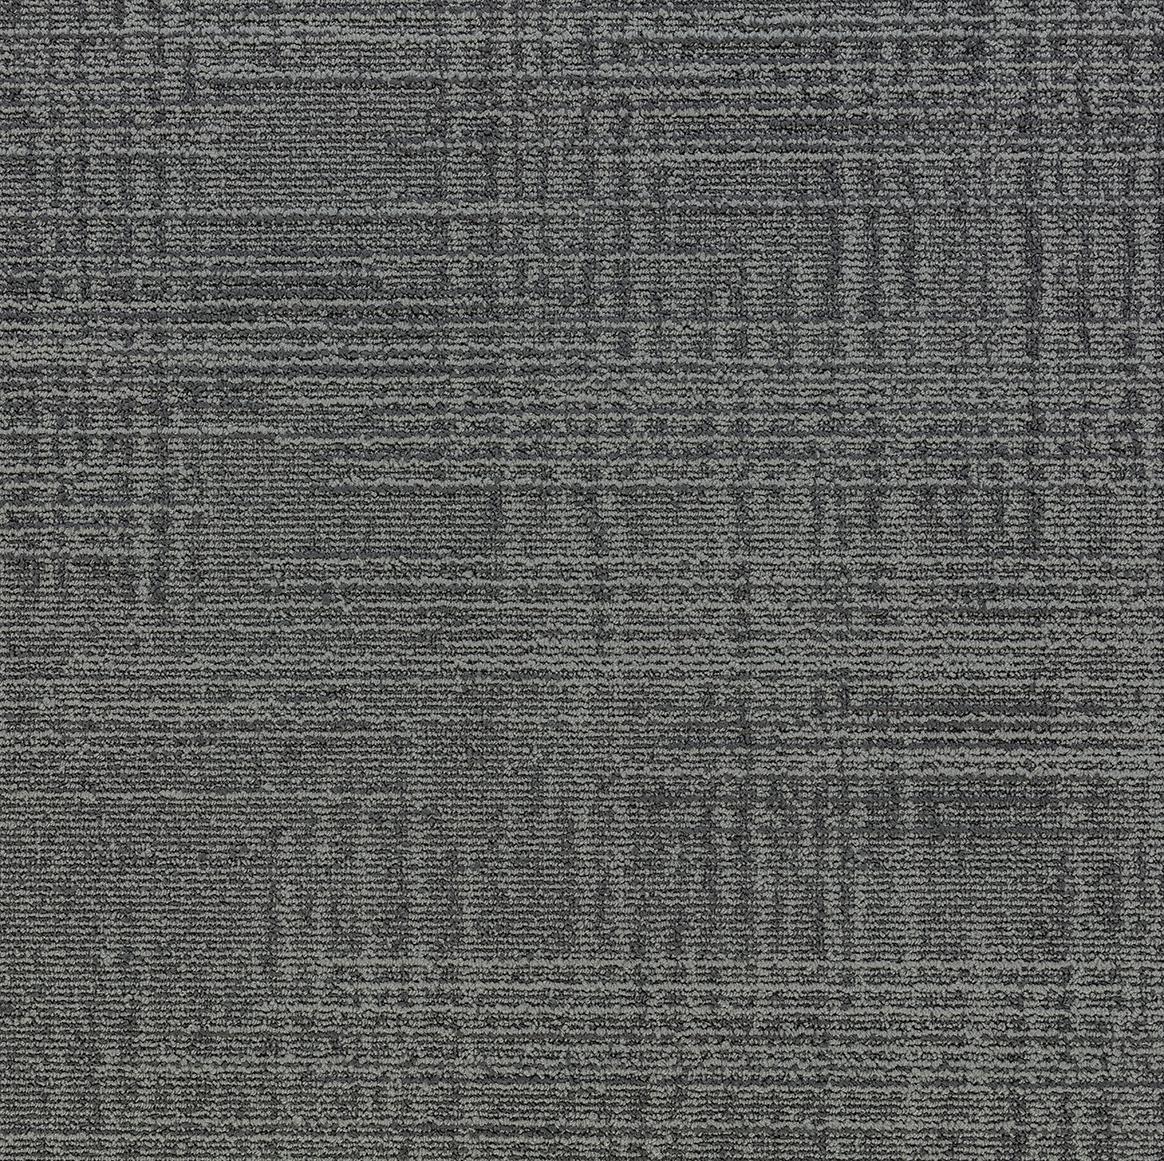 Haptics tile